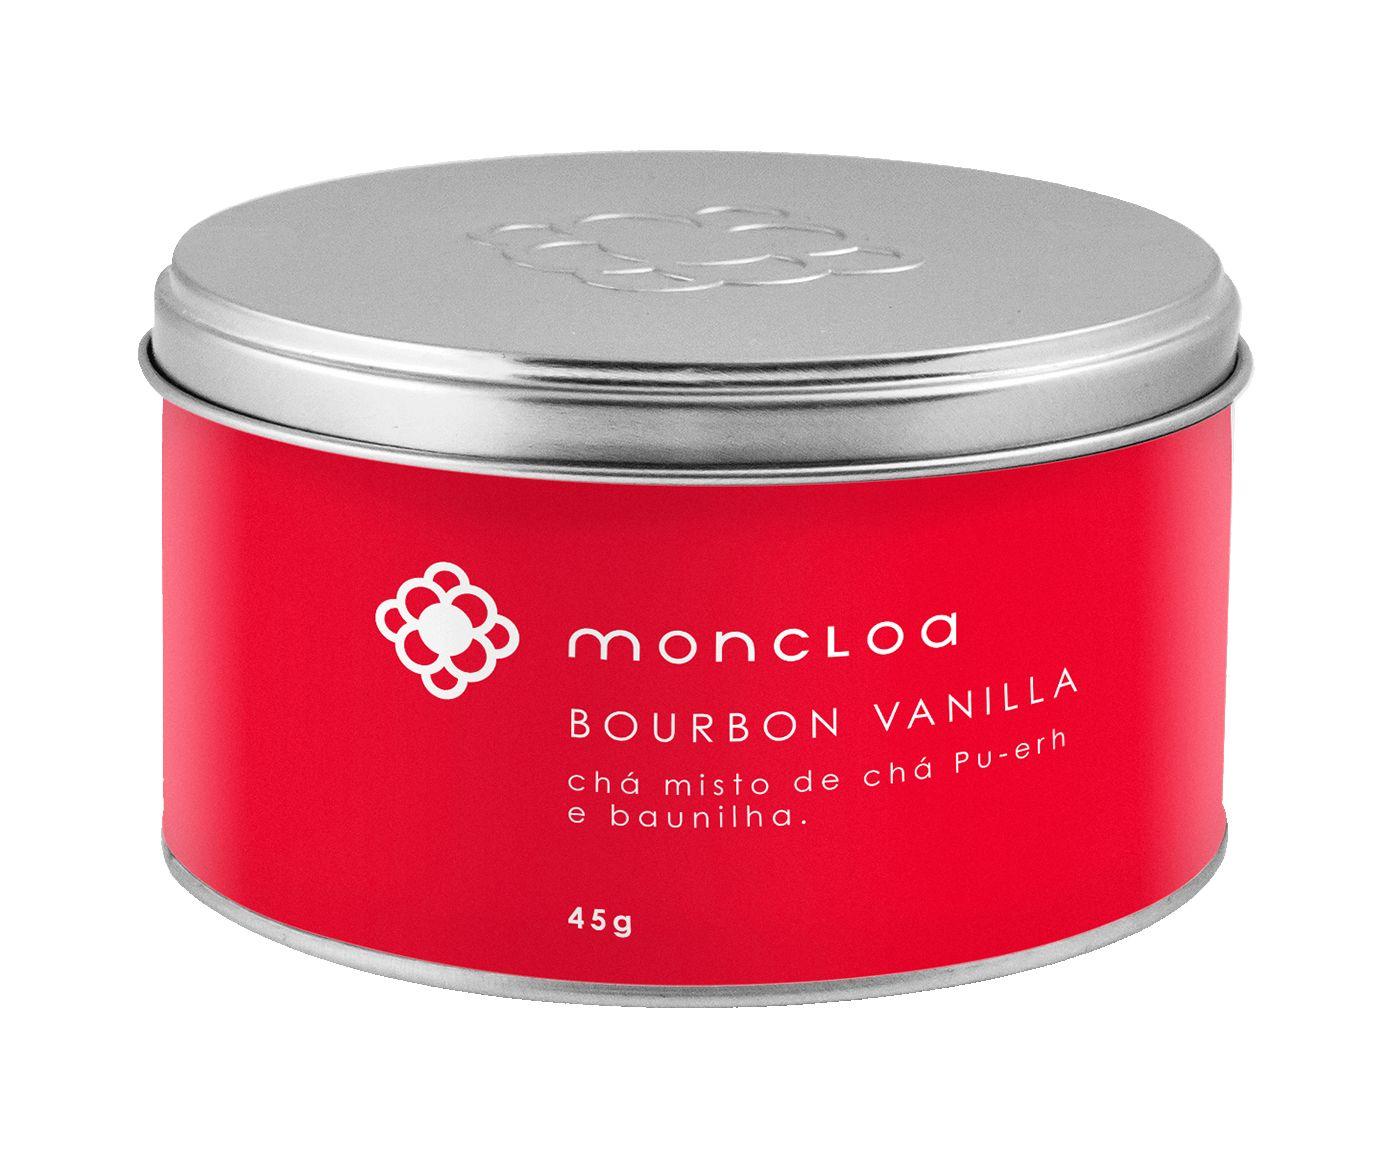 Chá Bourbon Vanilla - 45G | Westwing.com.br